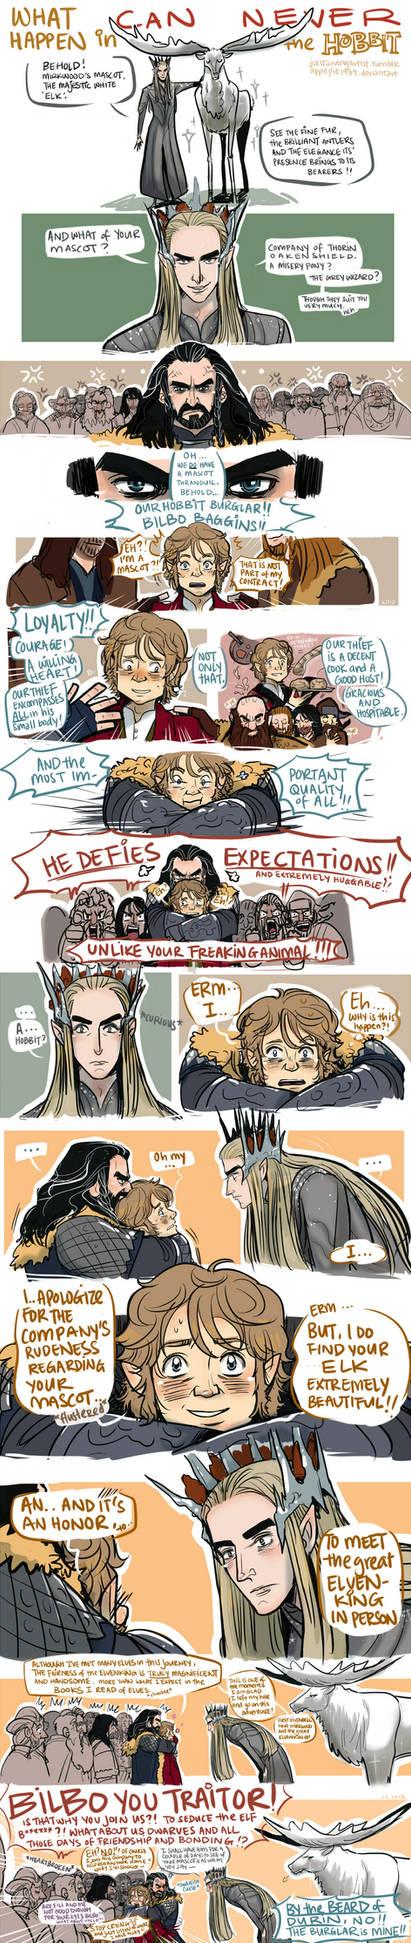 The Hobbit: What can NEVER Happen